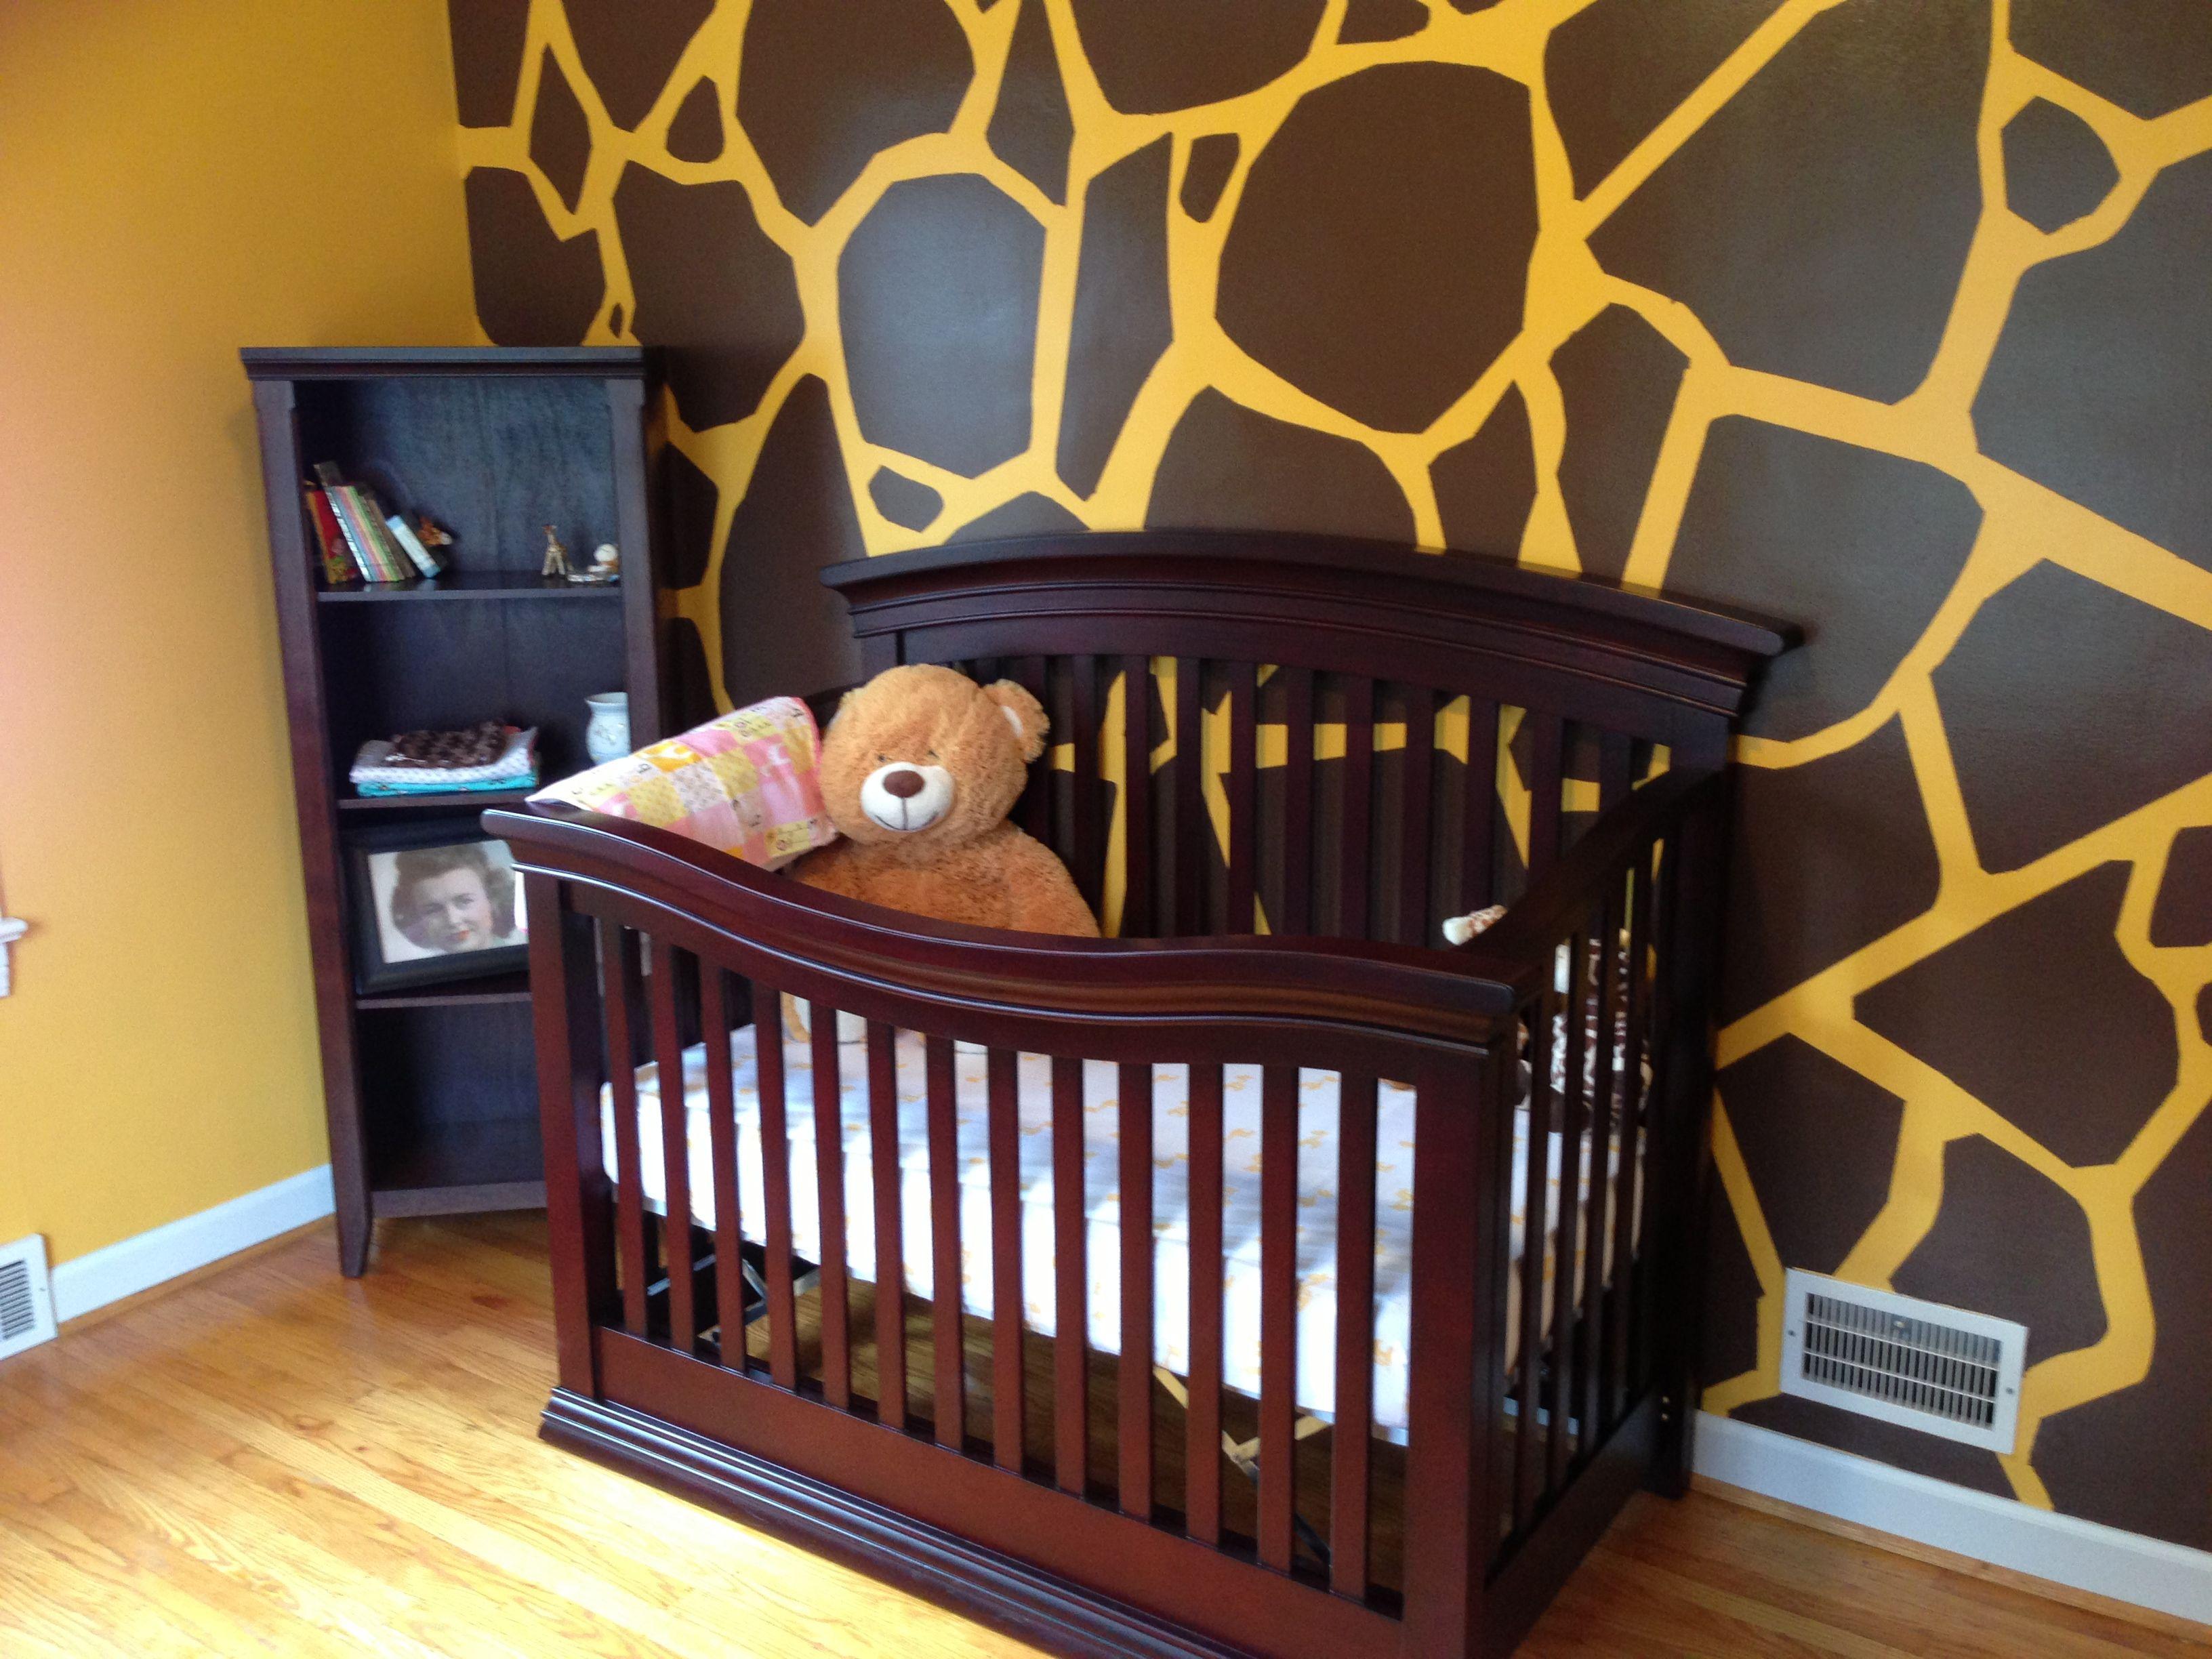 Giraffe wall | Home decor, Nursery, Decor